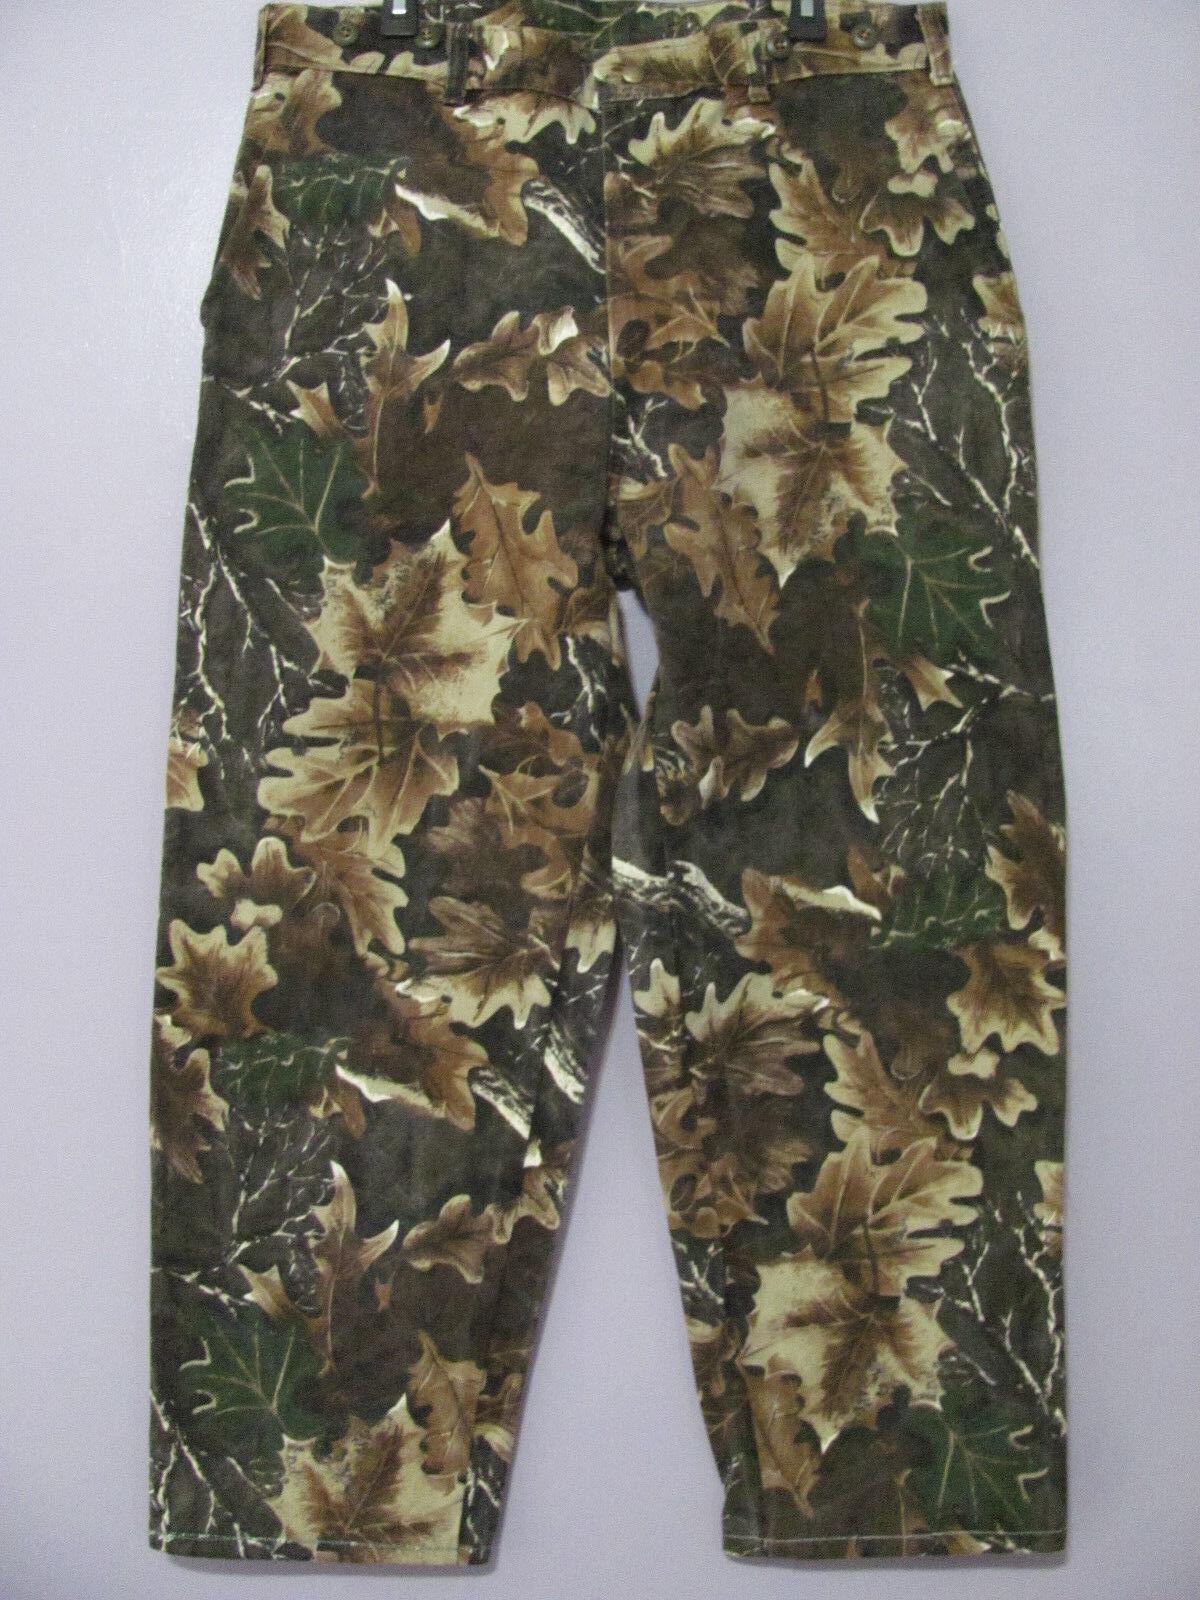 McAlister De Colección Algodón Encerado Paño De Estaño Camo Caza Pantalones MSR 37 x28.5 GUC